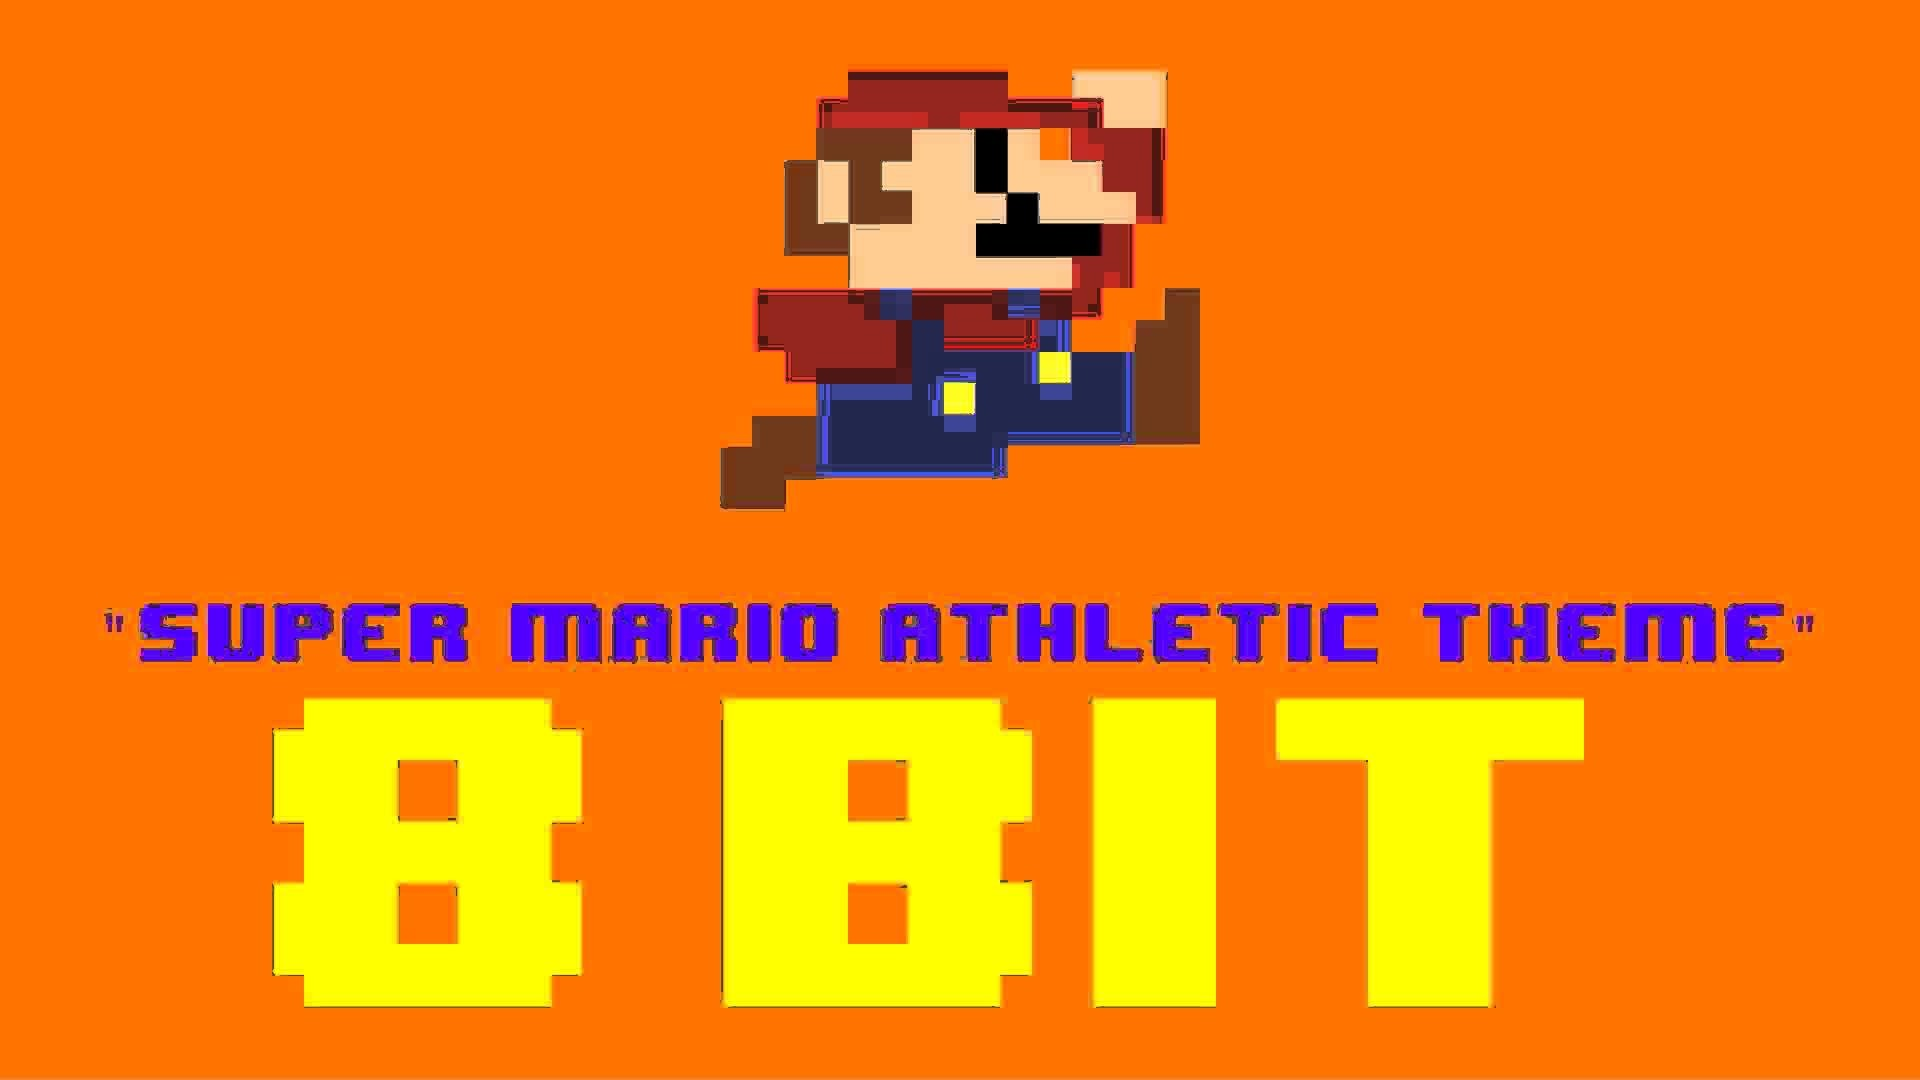 Live Girl Wallpaper For Mobile 8 Bit Mario Wallpaper 70 Images